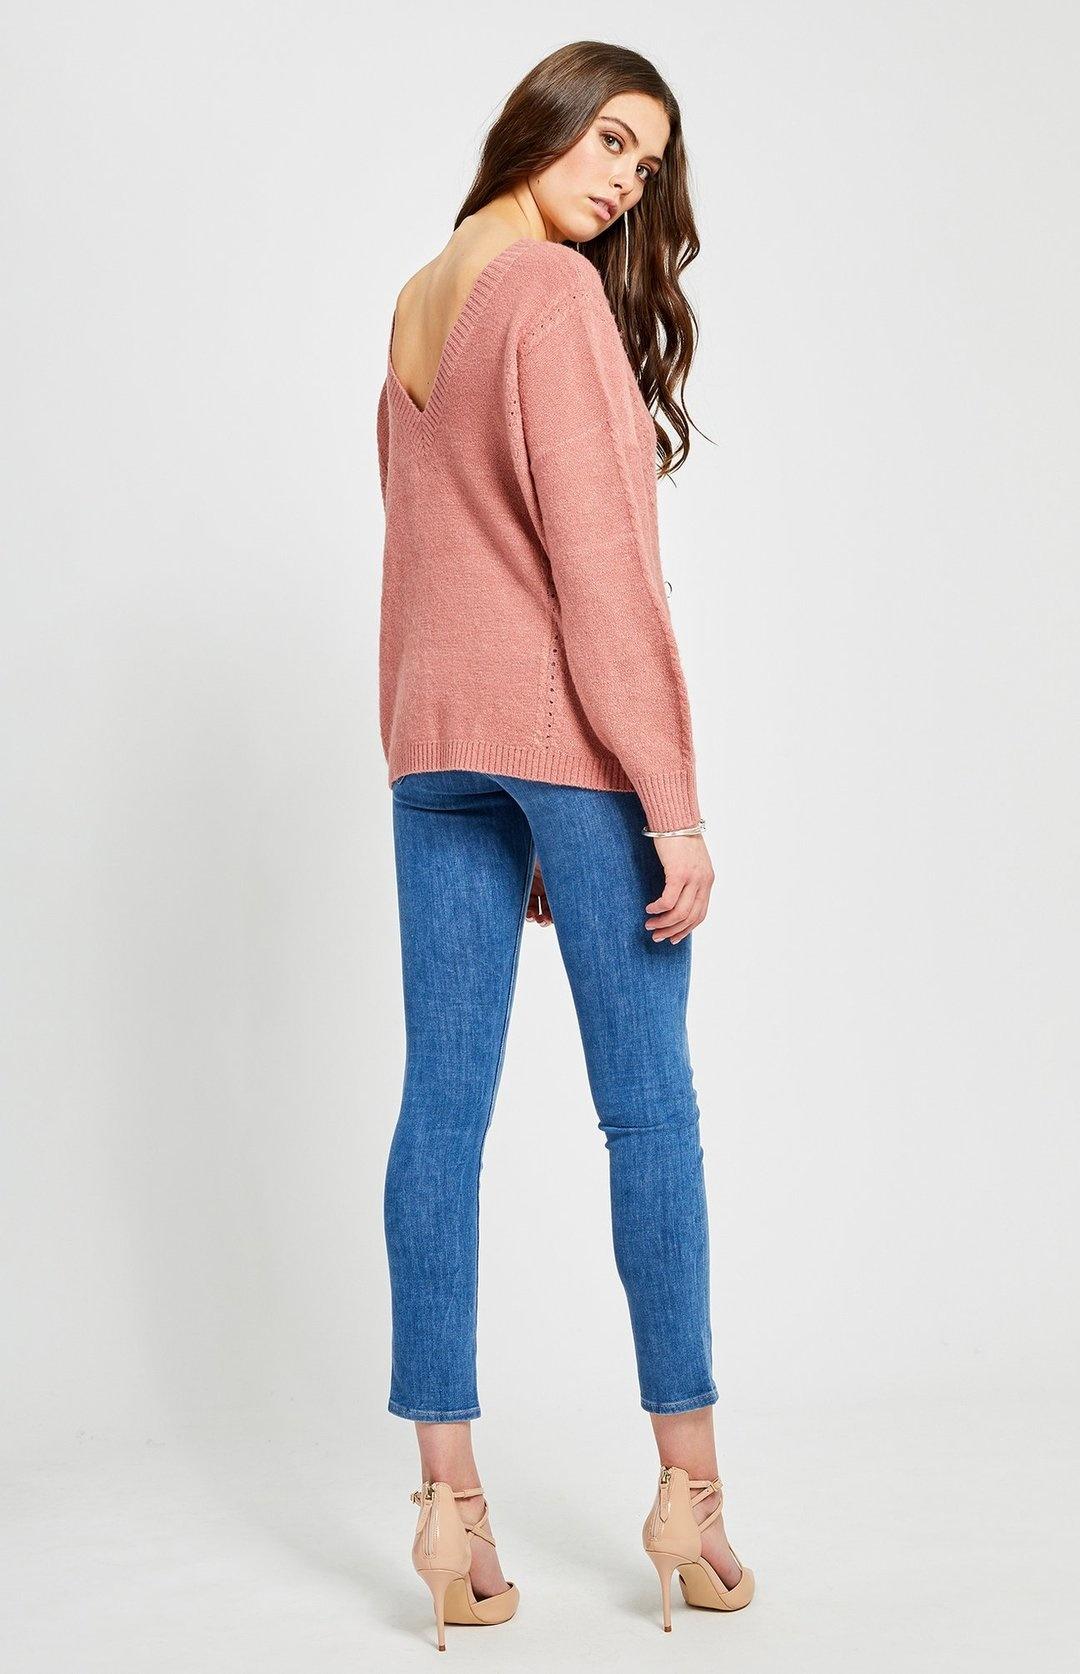 Gentlefawn Cosmo Sweater